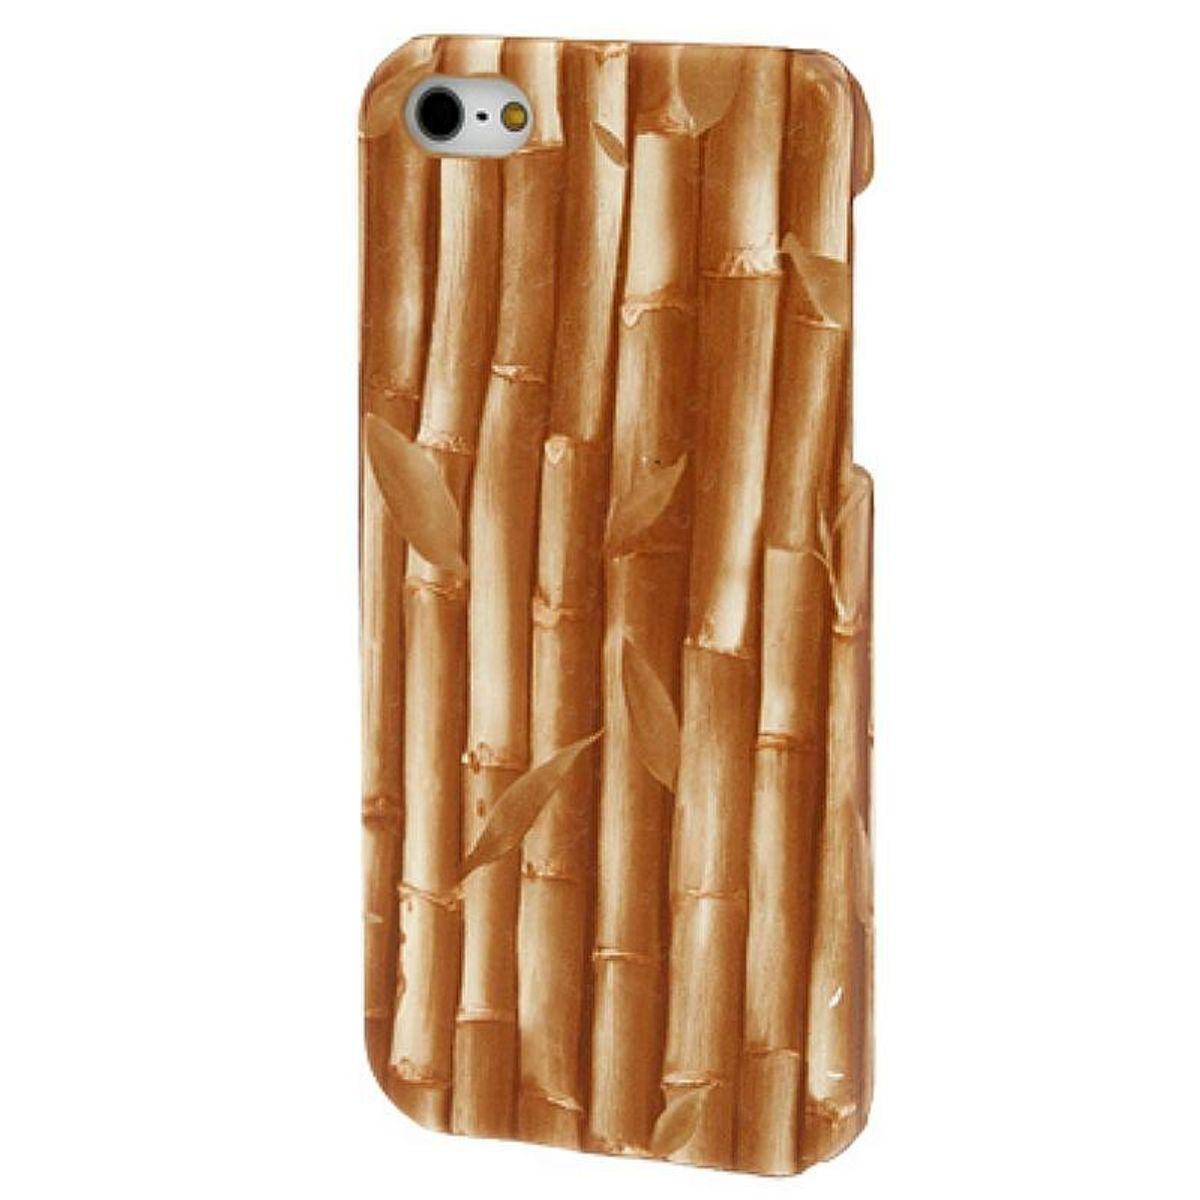 schutzh lle im bambus design f r apple iphone se. Black Bedroom Furniture Sets. Home Design Ideas